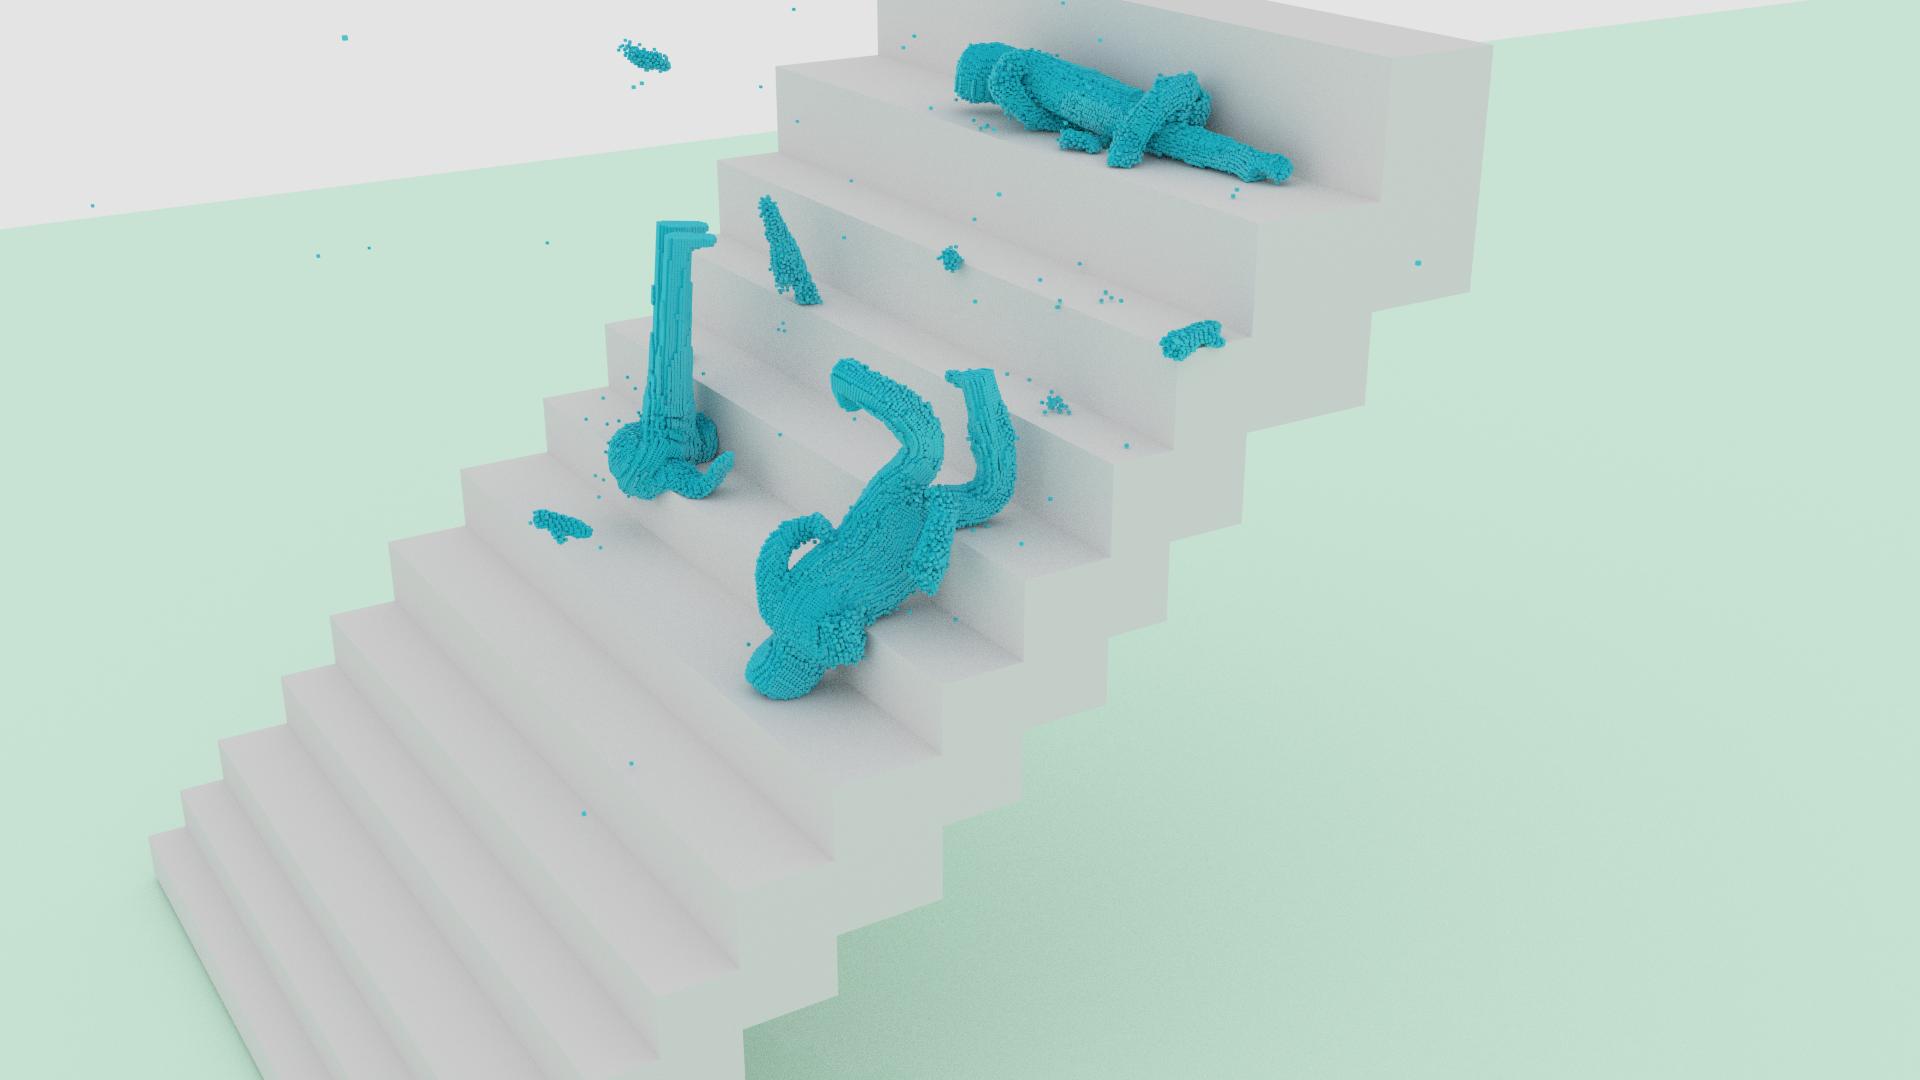 Blender Molecular Simulations [Animation Comp] by Shastro